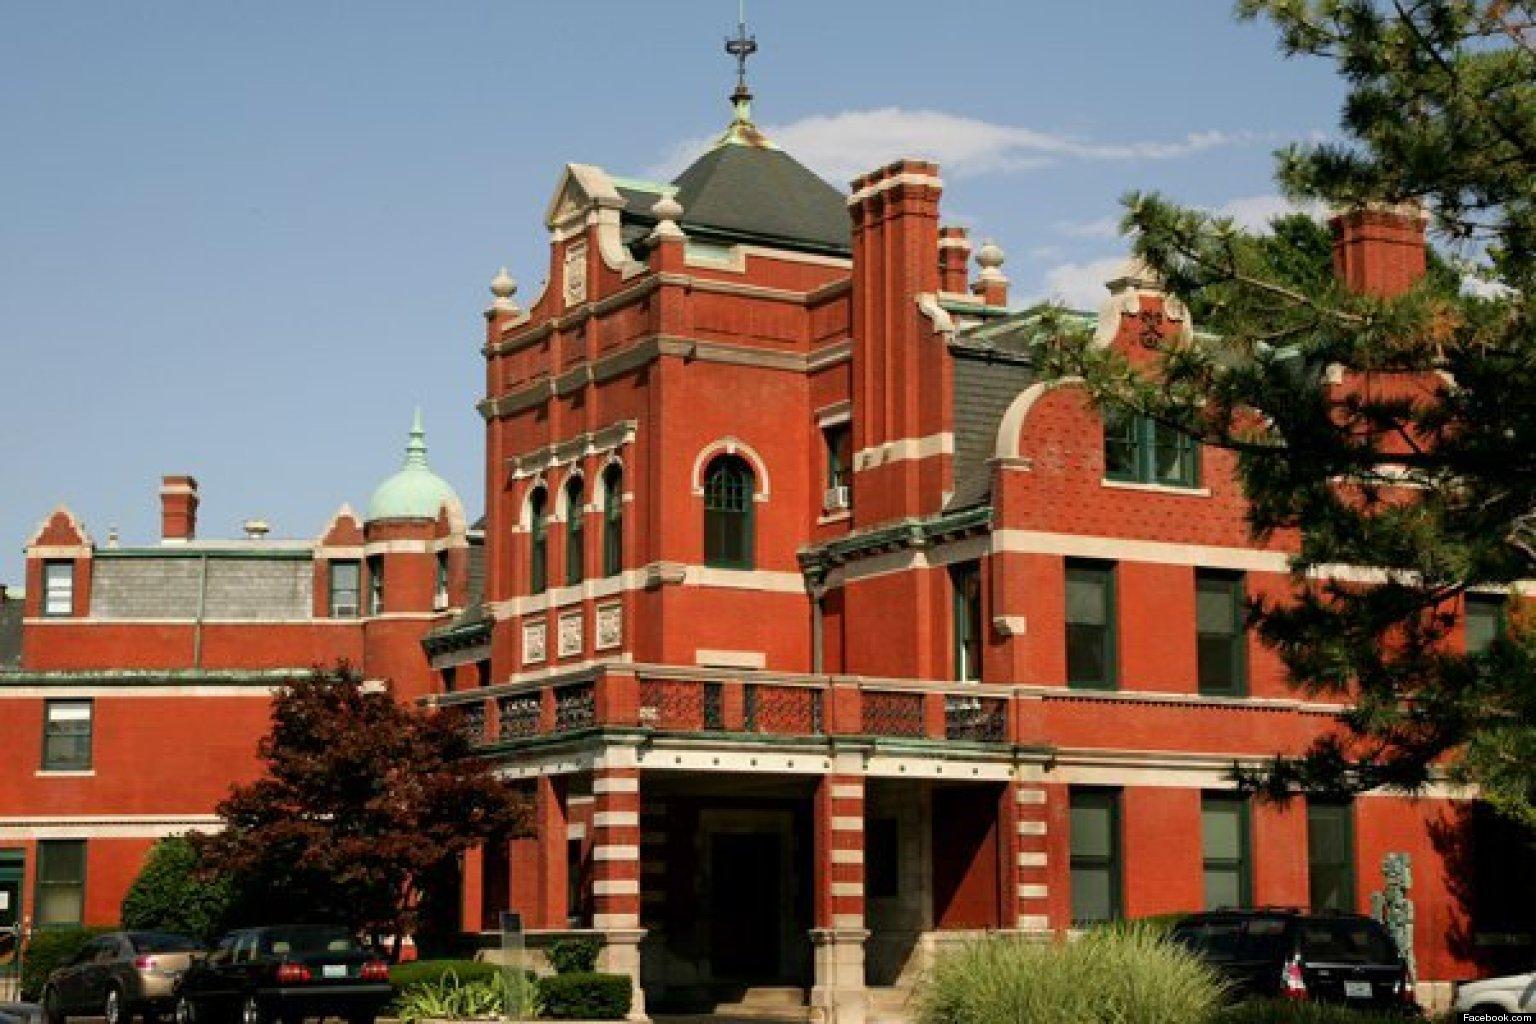 Kansas City Art Institute